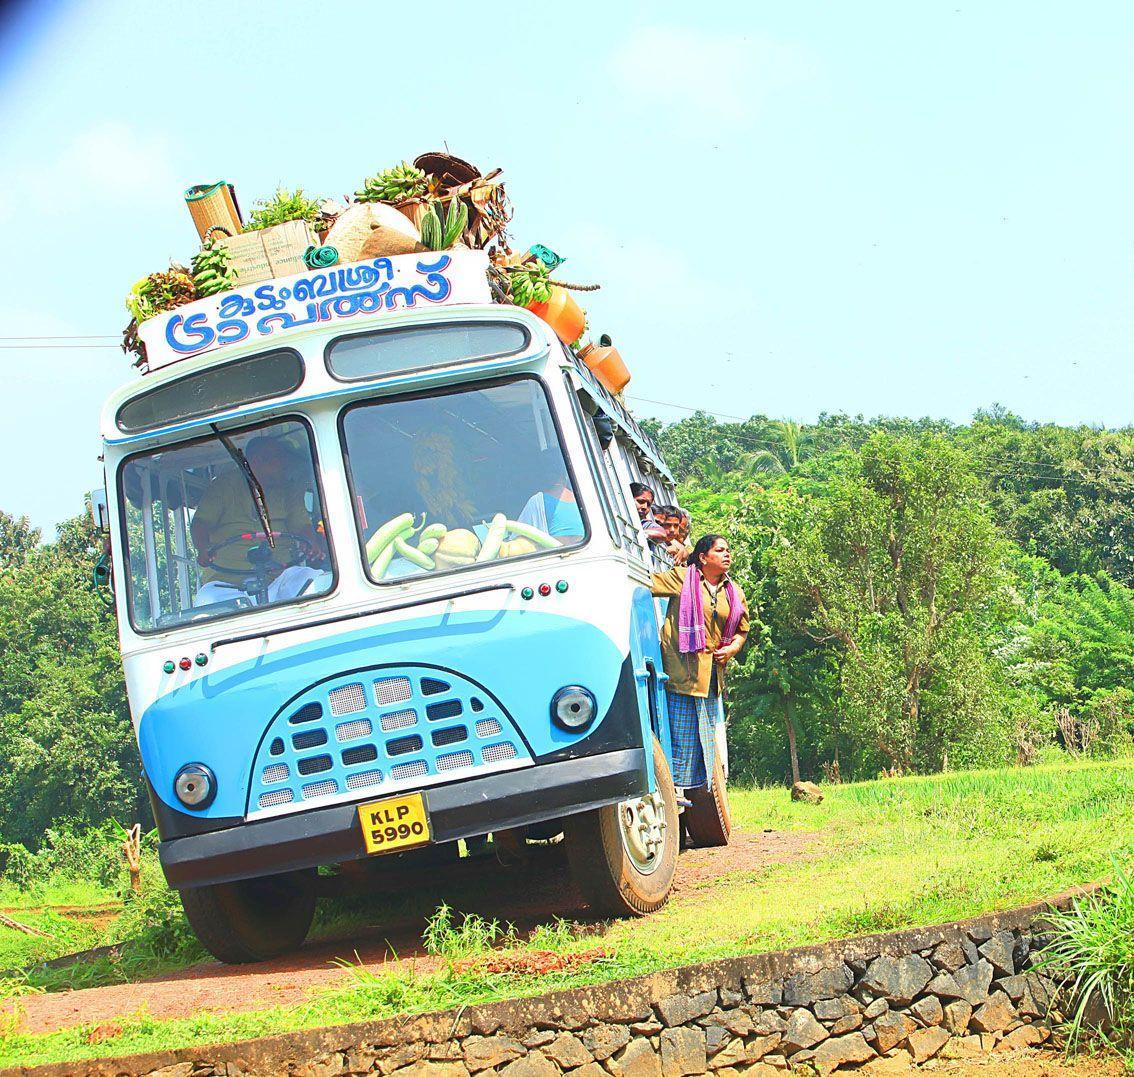 http://2.bp.blogspot.com/_BQRUOgADUyU/TOvMQEf6k_I/AAAAAAAAG44/N8rT0BPMp8U/s1600/kudumbasree-travels-malayalam+%252866%2529.jpg